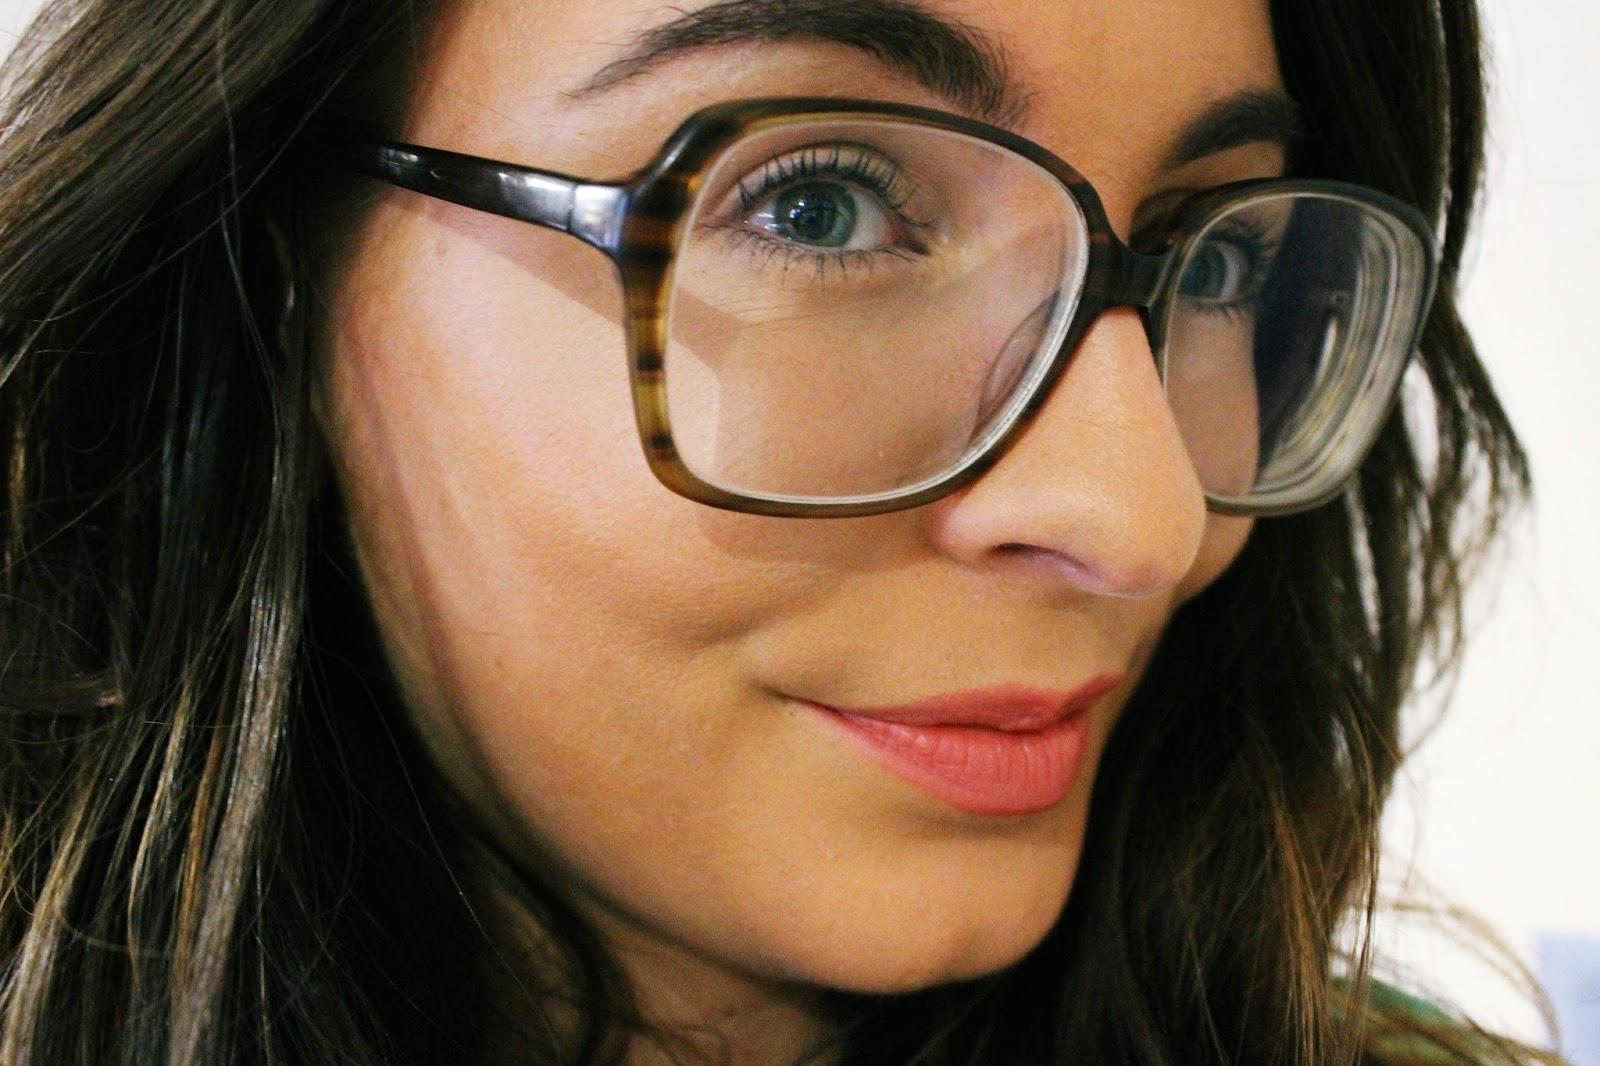 Montures lunettes xxl